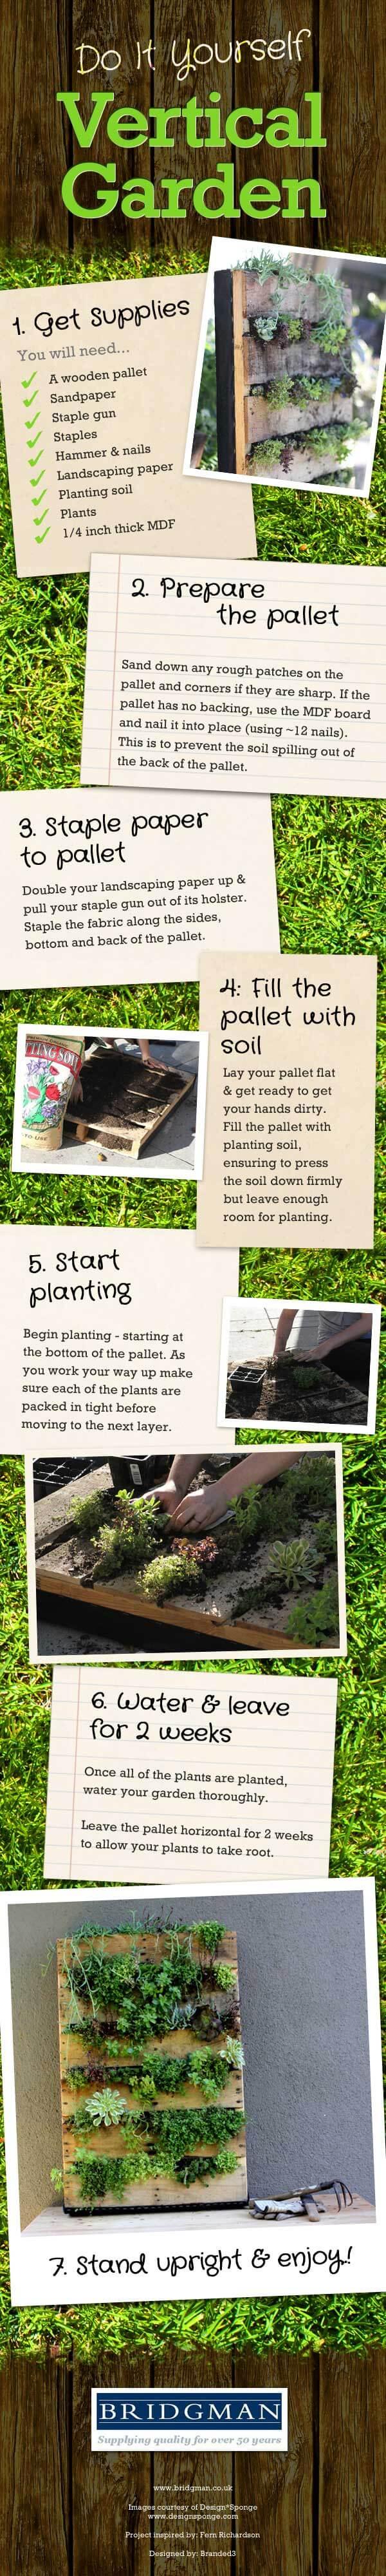 DIY vertical garden wall infographic